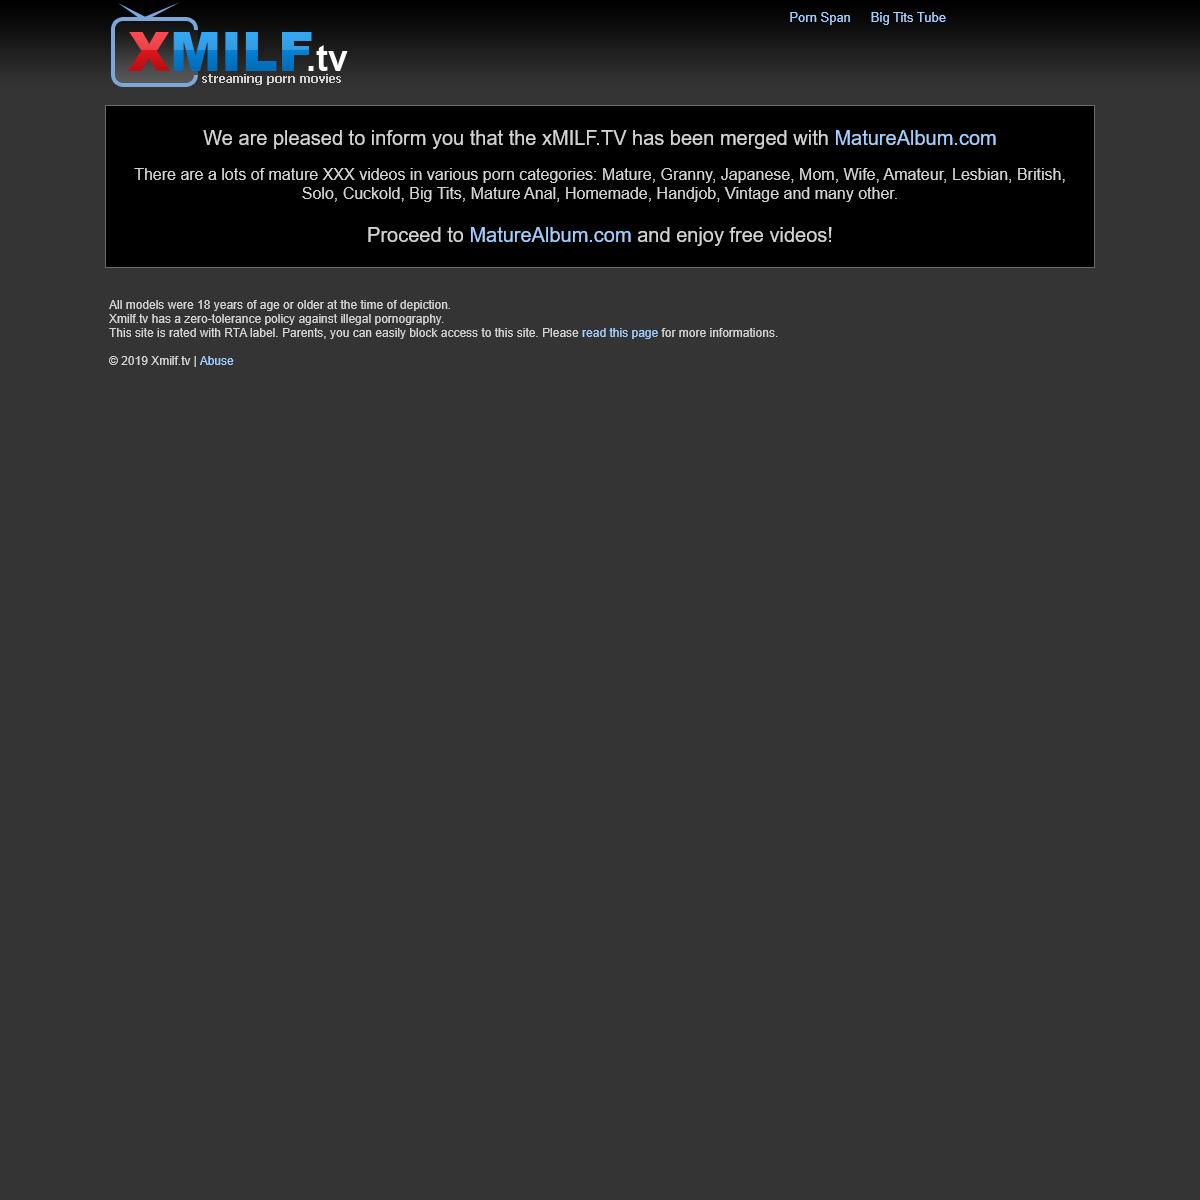 A complete backup of www.www.xmilf.tv